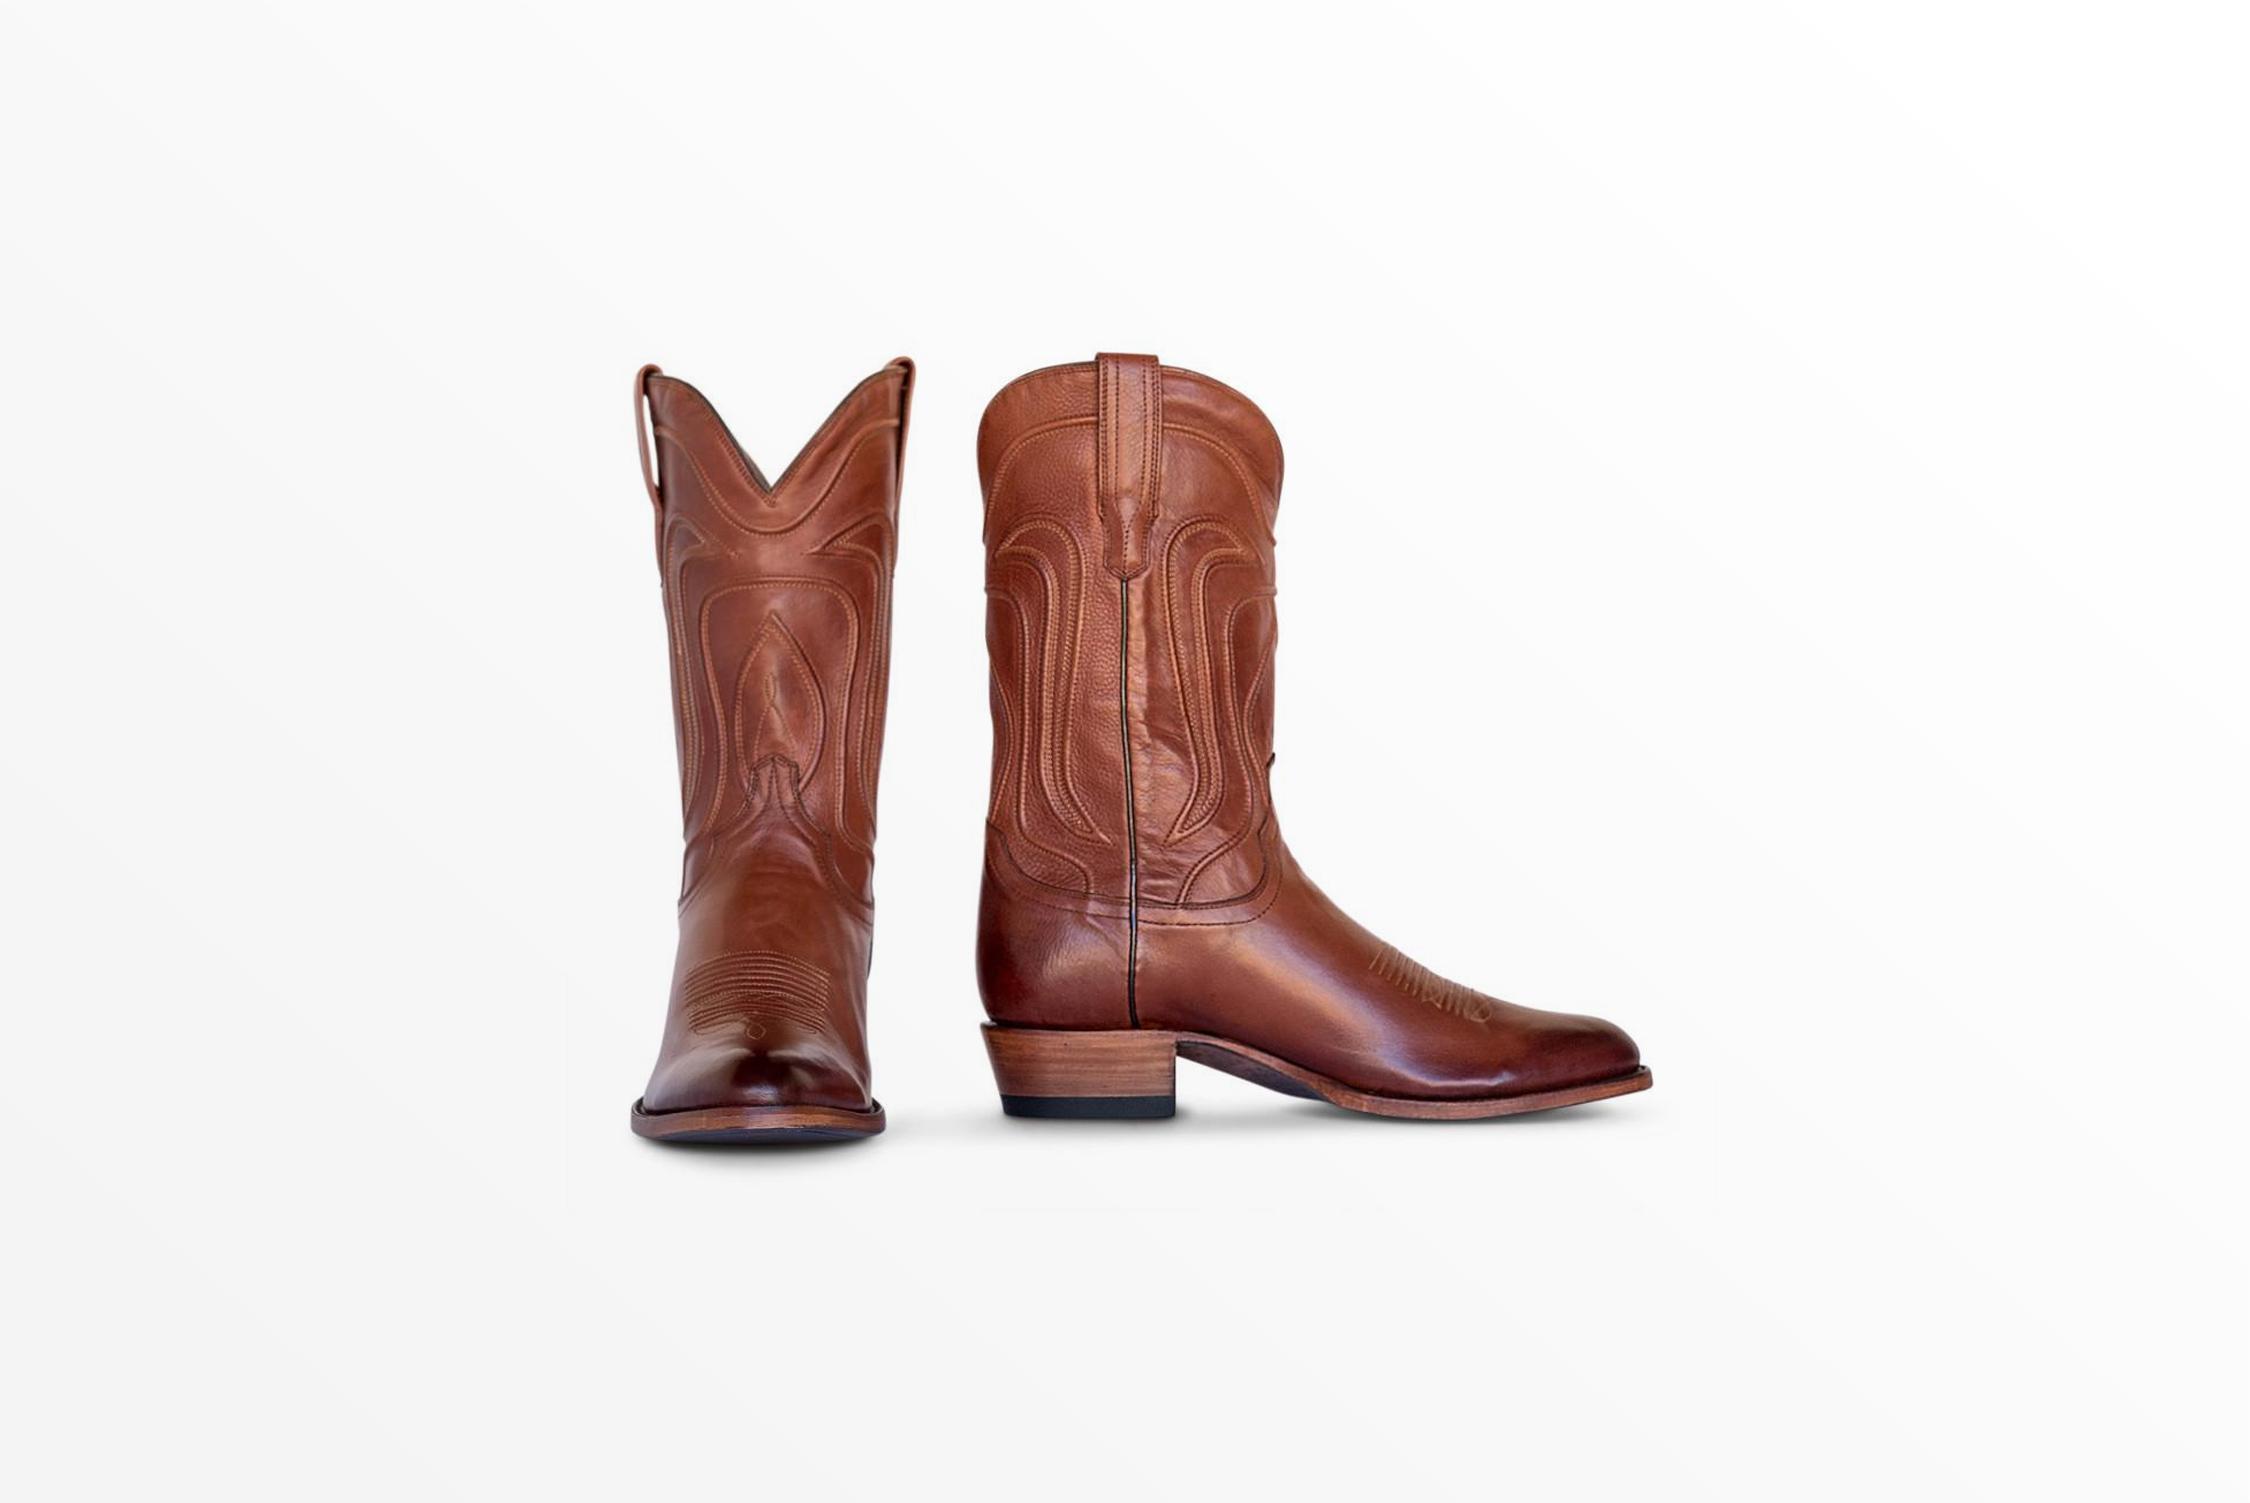 Tecovas Boots - Cartwright Bourbon Calf